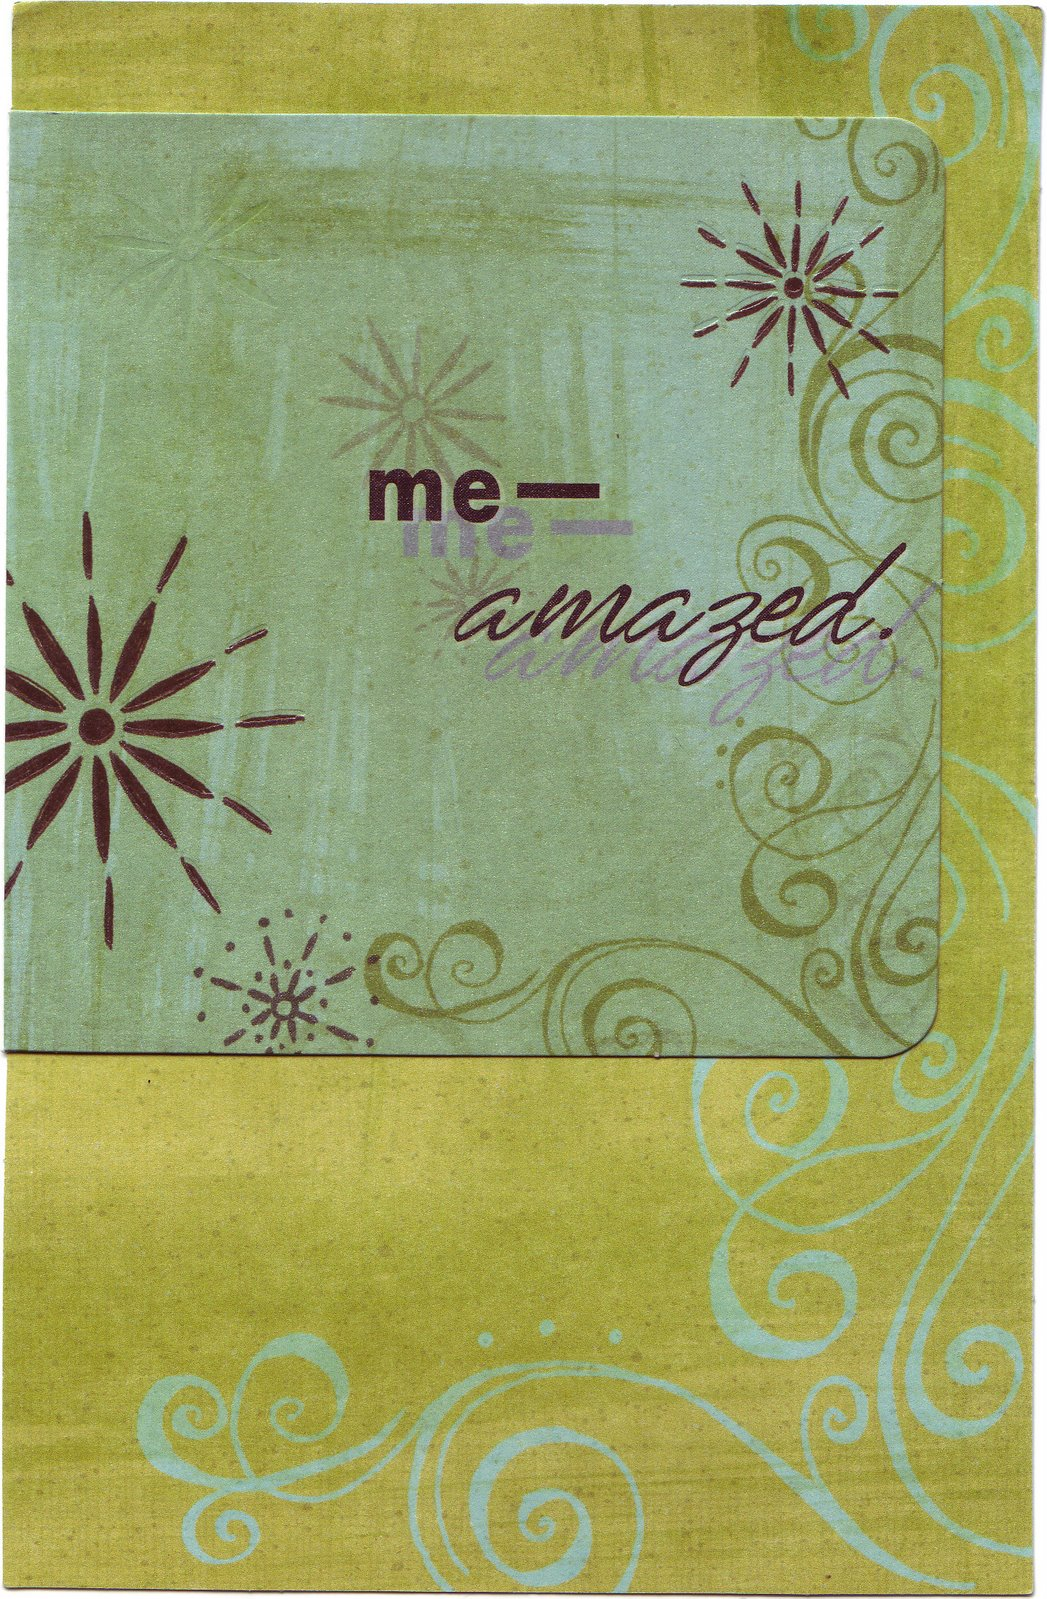 card sample2.jpg